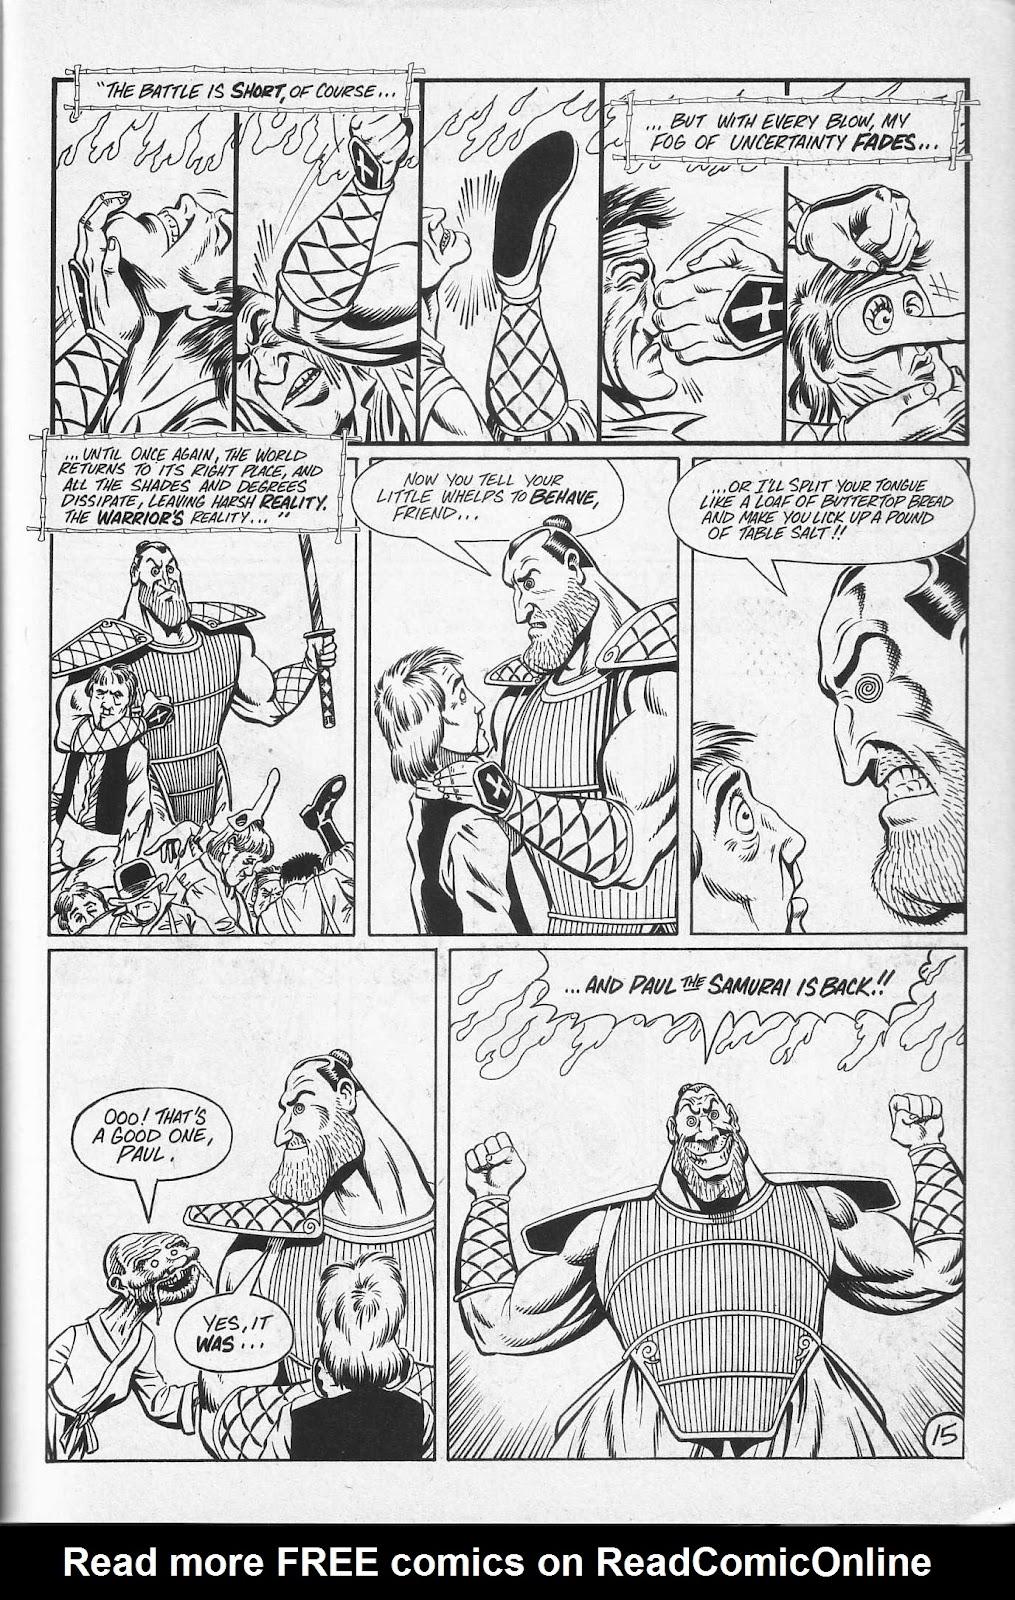 Read online Paul the Samurai (1991) comic -  Issue # TPB - 81